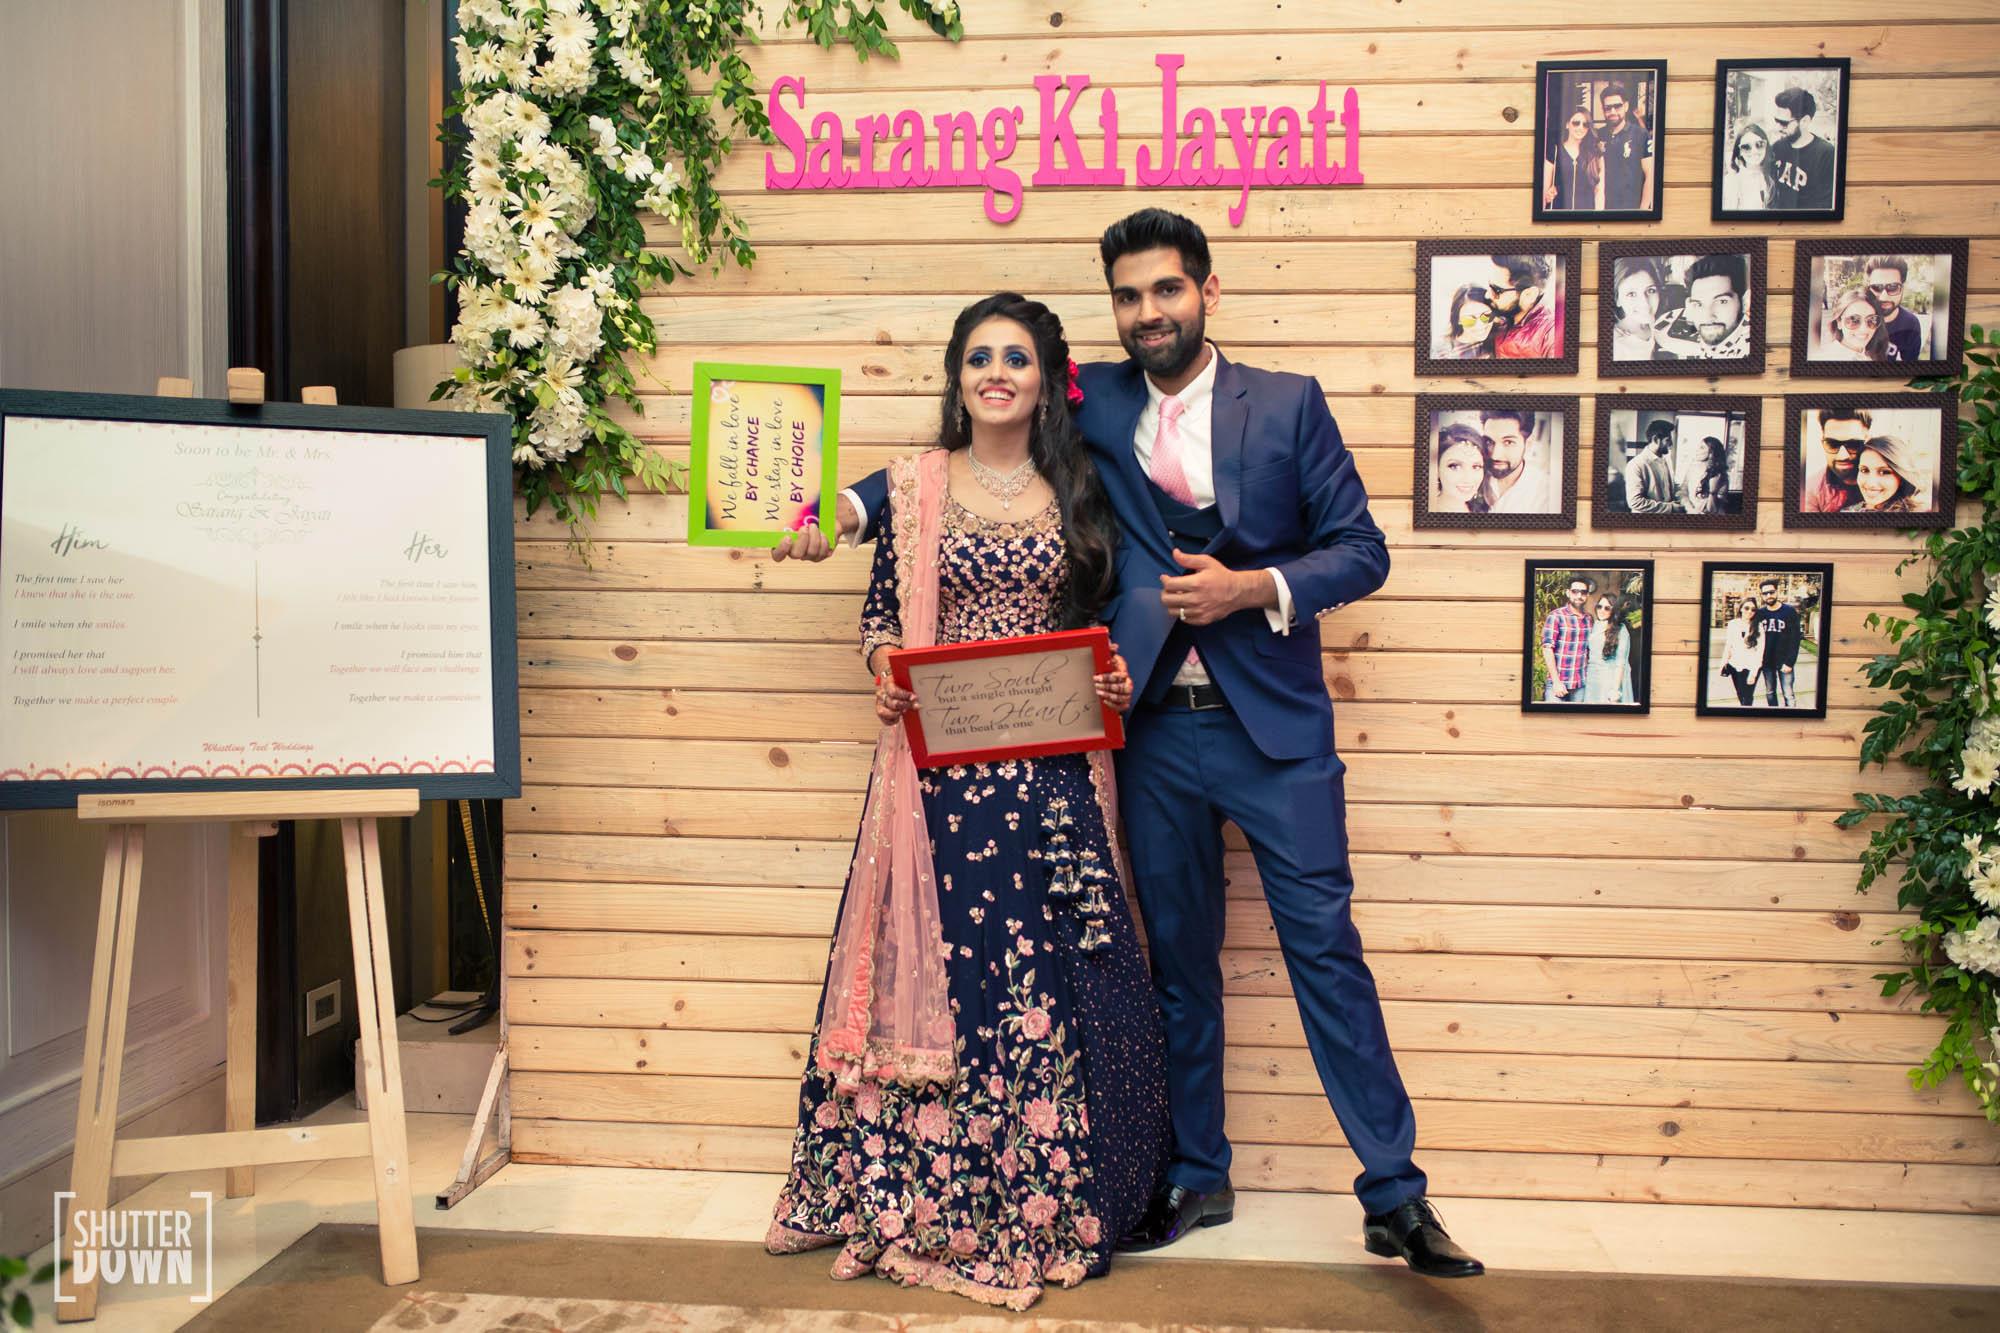 Sarang + Jayati | Mussoorie Wedding